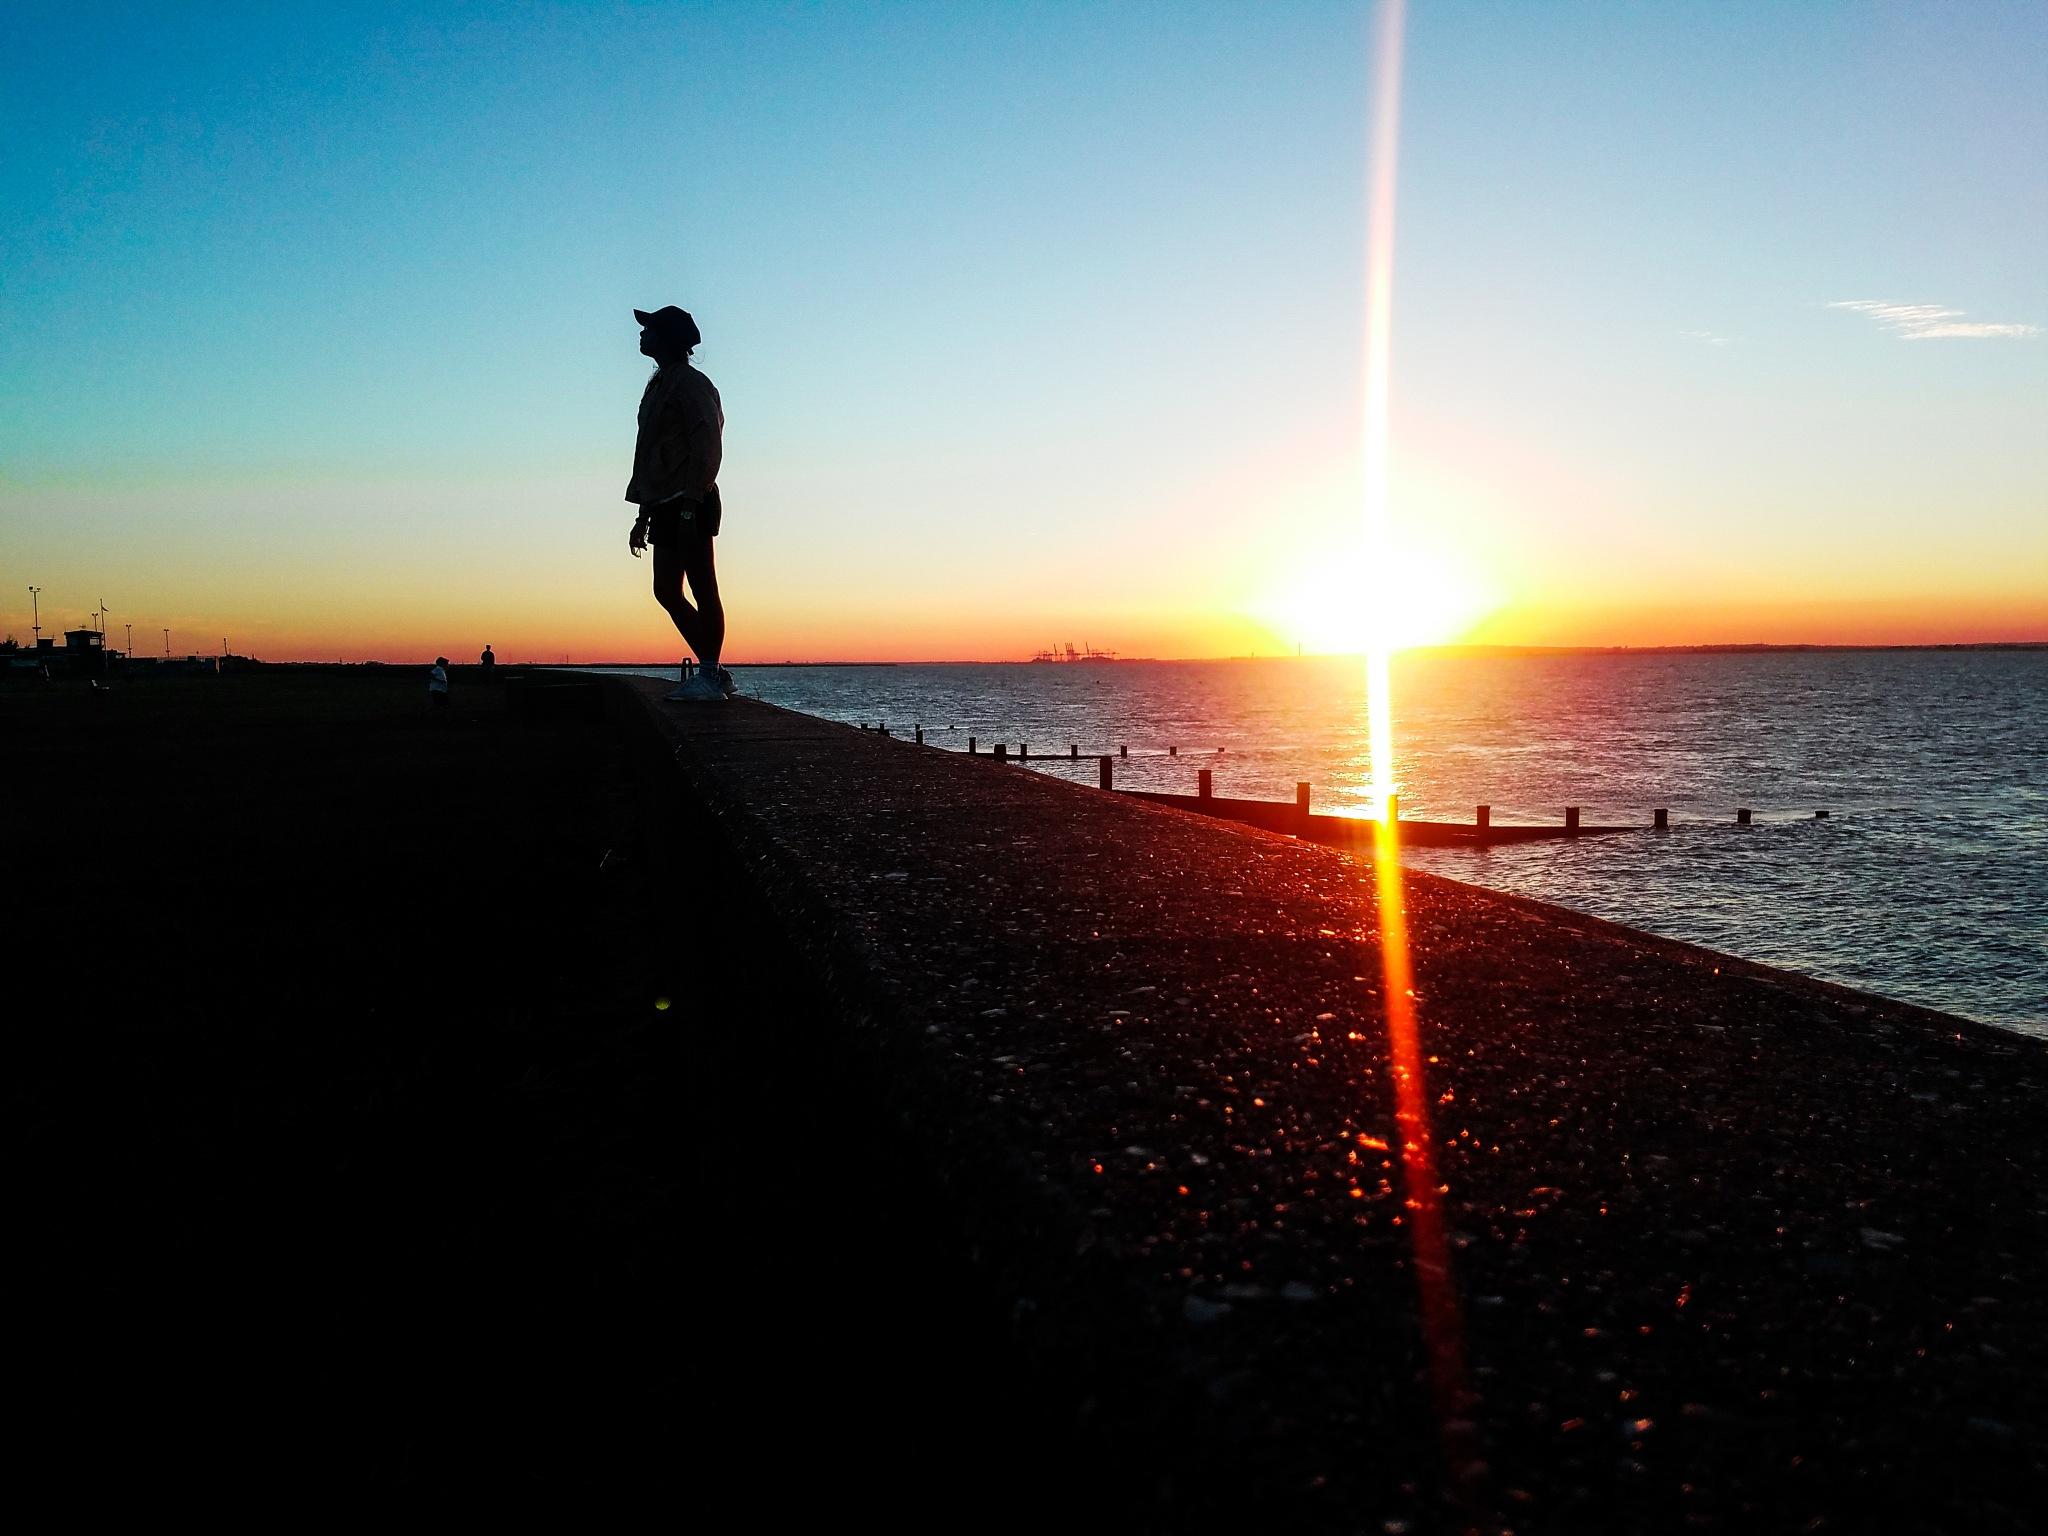 Sunset in Allhallows caravan park, Kent by princessdianelonzanida